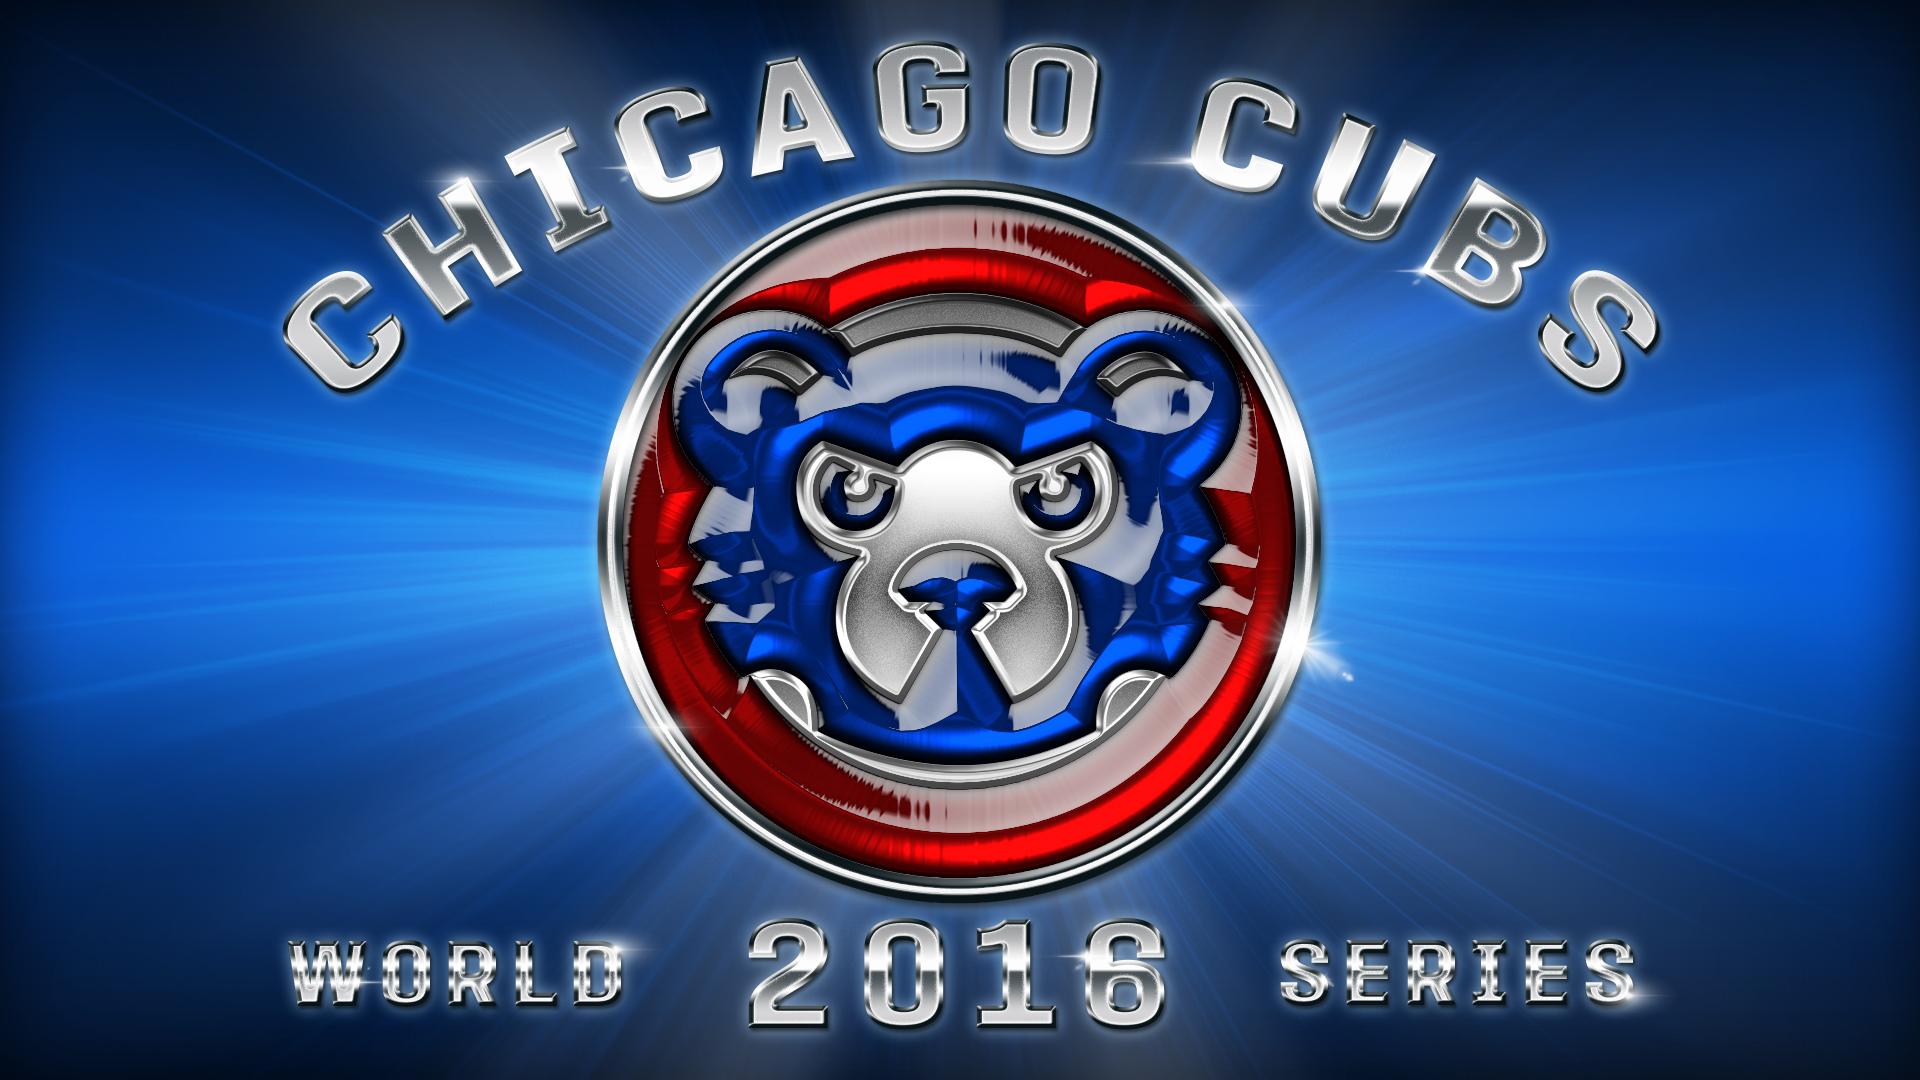 Chicago cubs world series wallpaper by balsavor on deviantart - Cubs background ...